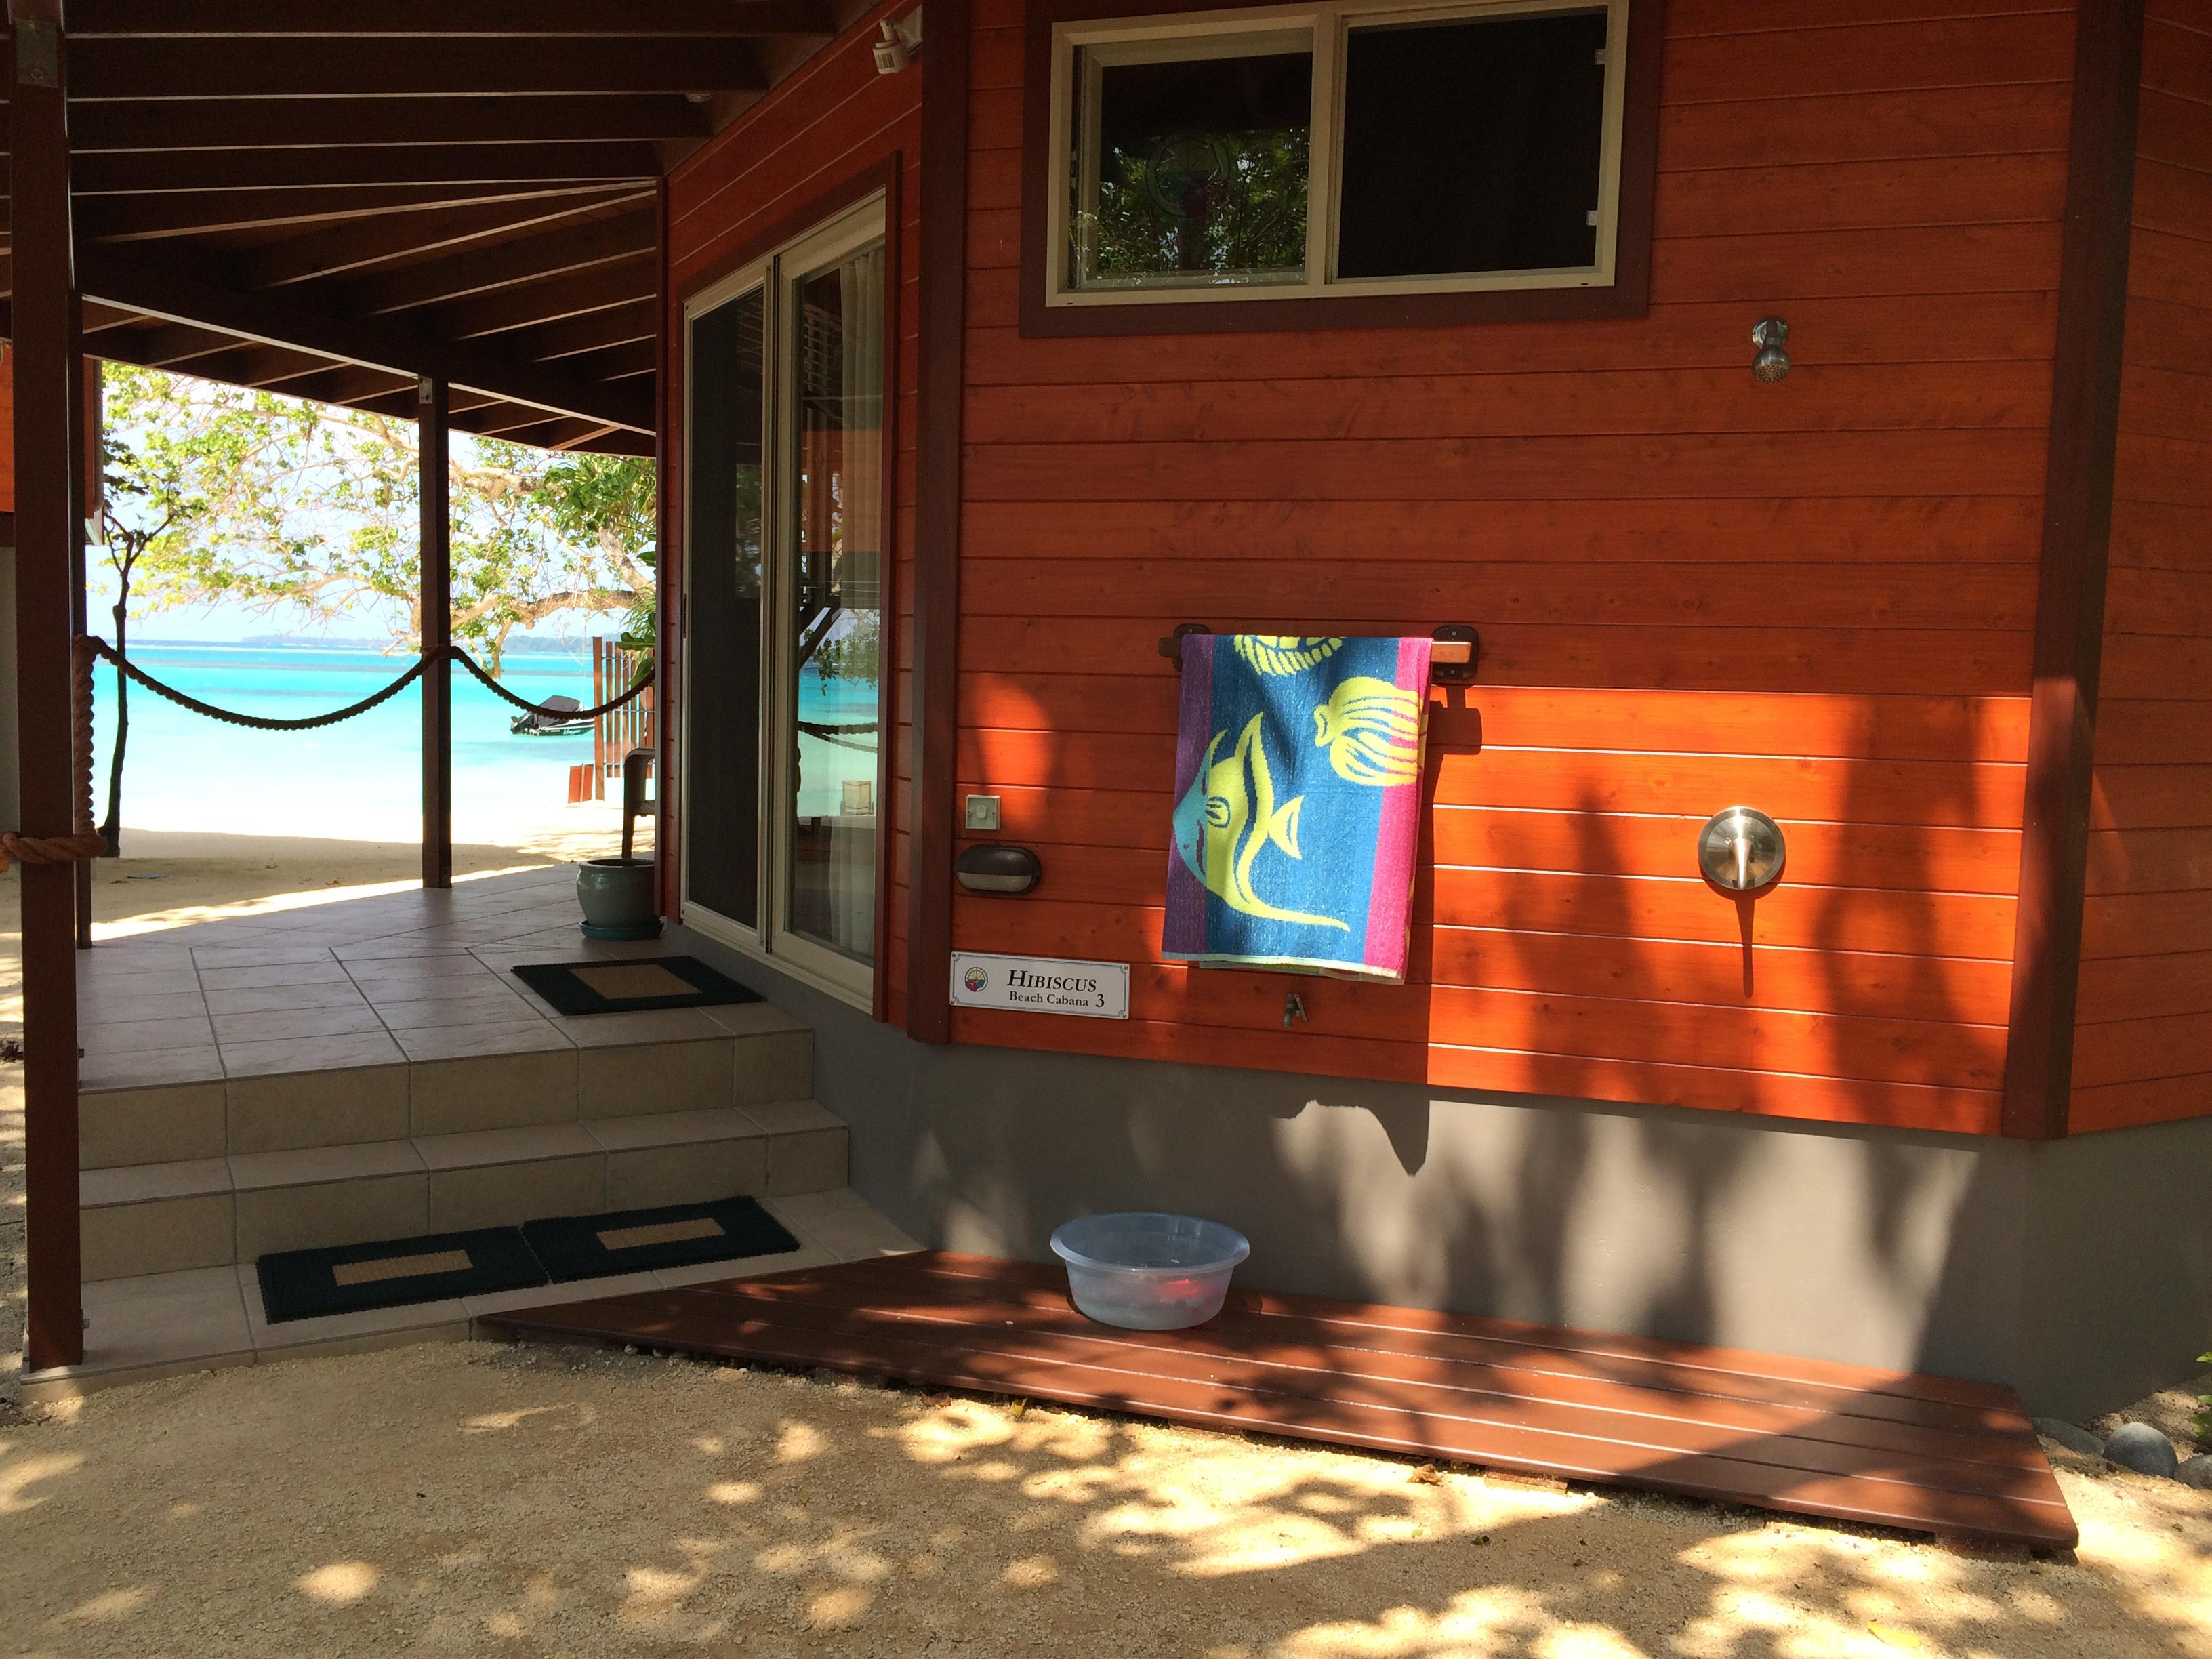 The Hibiscus Private Beach Cabana